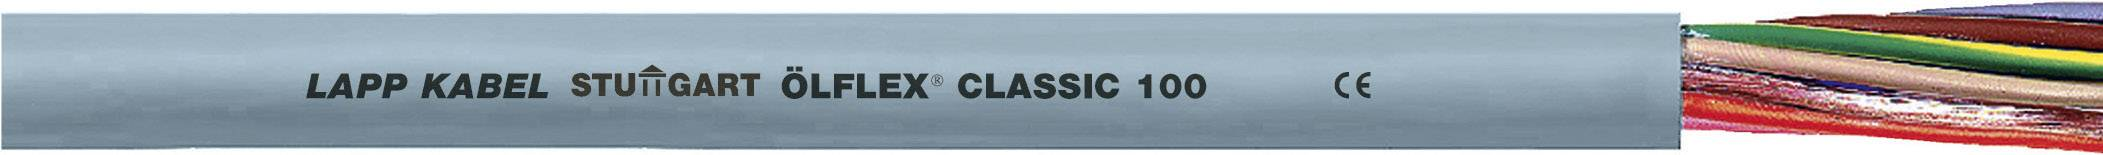 Kabel LappKabel Ölflex CLASSIC 100 5G1 (00100444), PVC, 7,1 mm, 500 V, šedá, 500 m